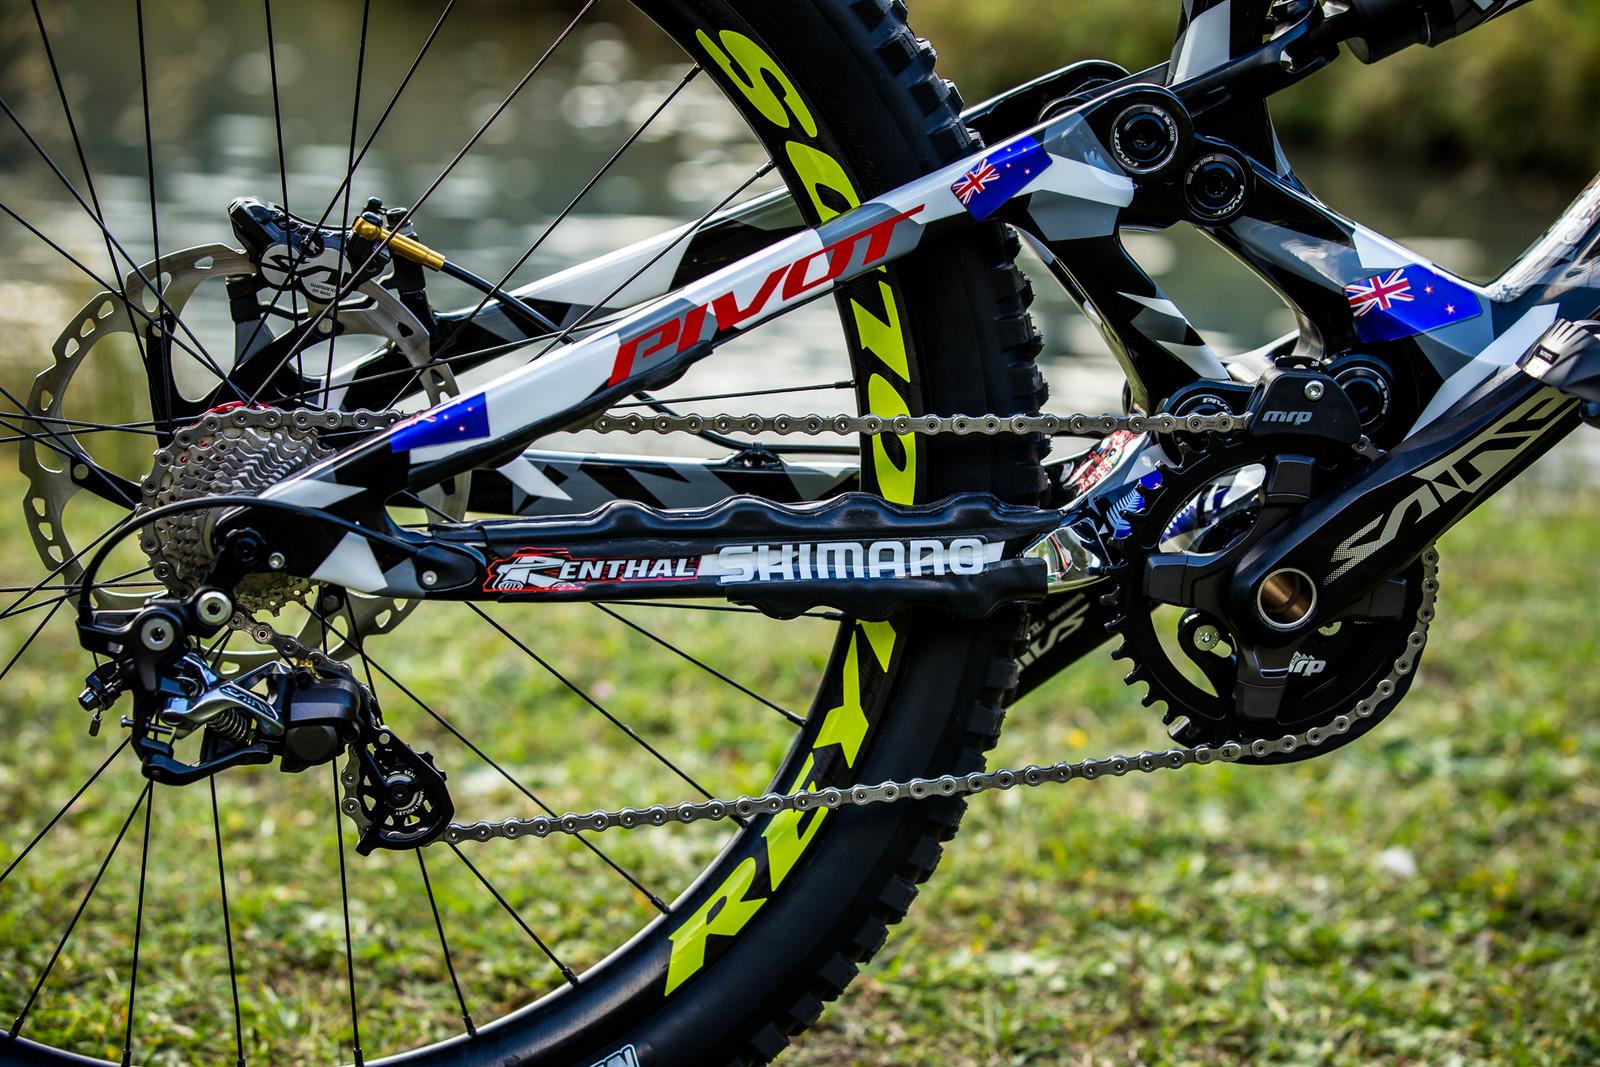 Shimano Drivetrain with Custom Chainstay Protector - WORLD CHAMPS BIKE - Eddie Masters' Pivot Phoenix - Mountain Biking Pictures - Vital MTB